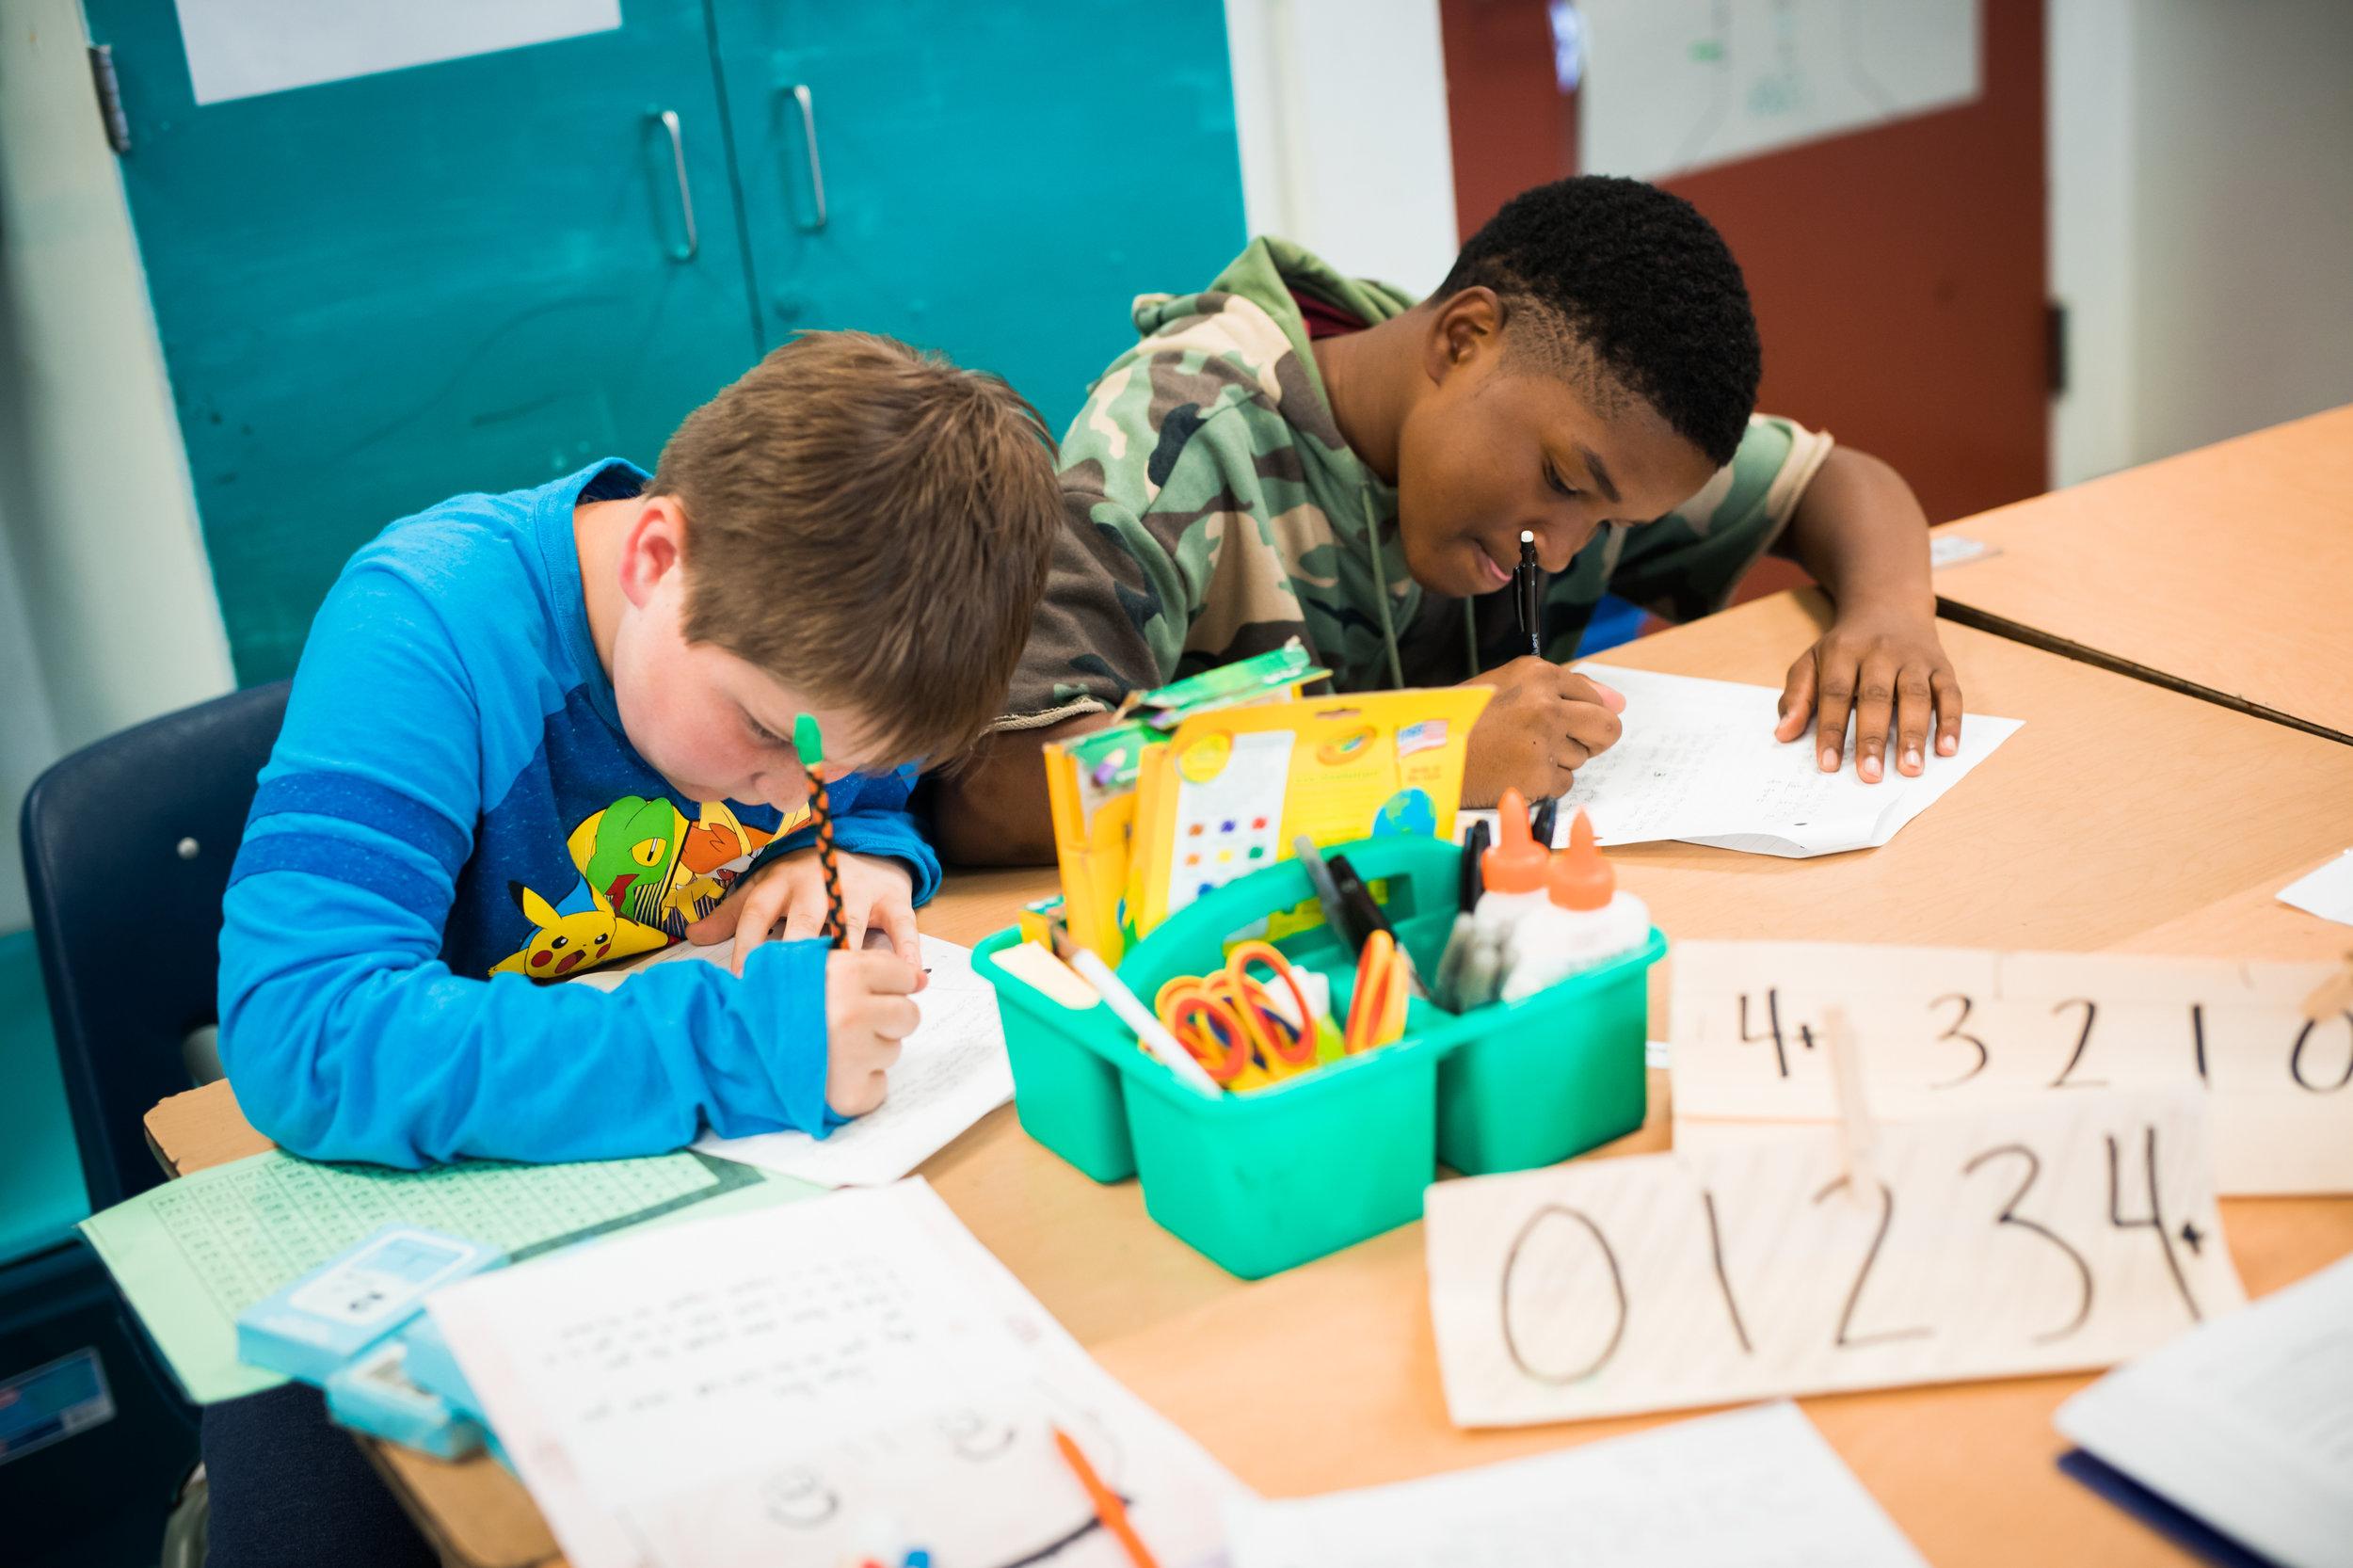 middle school students doing classwork